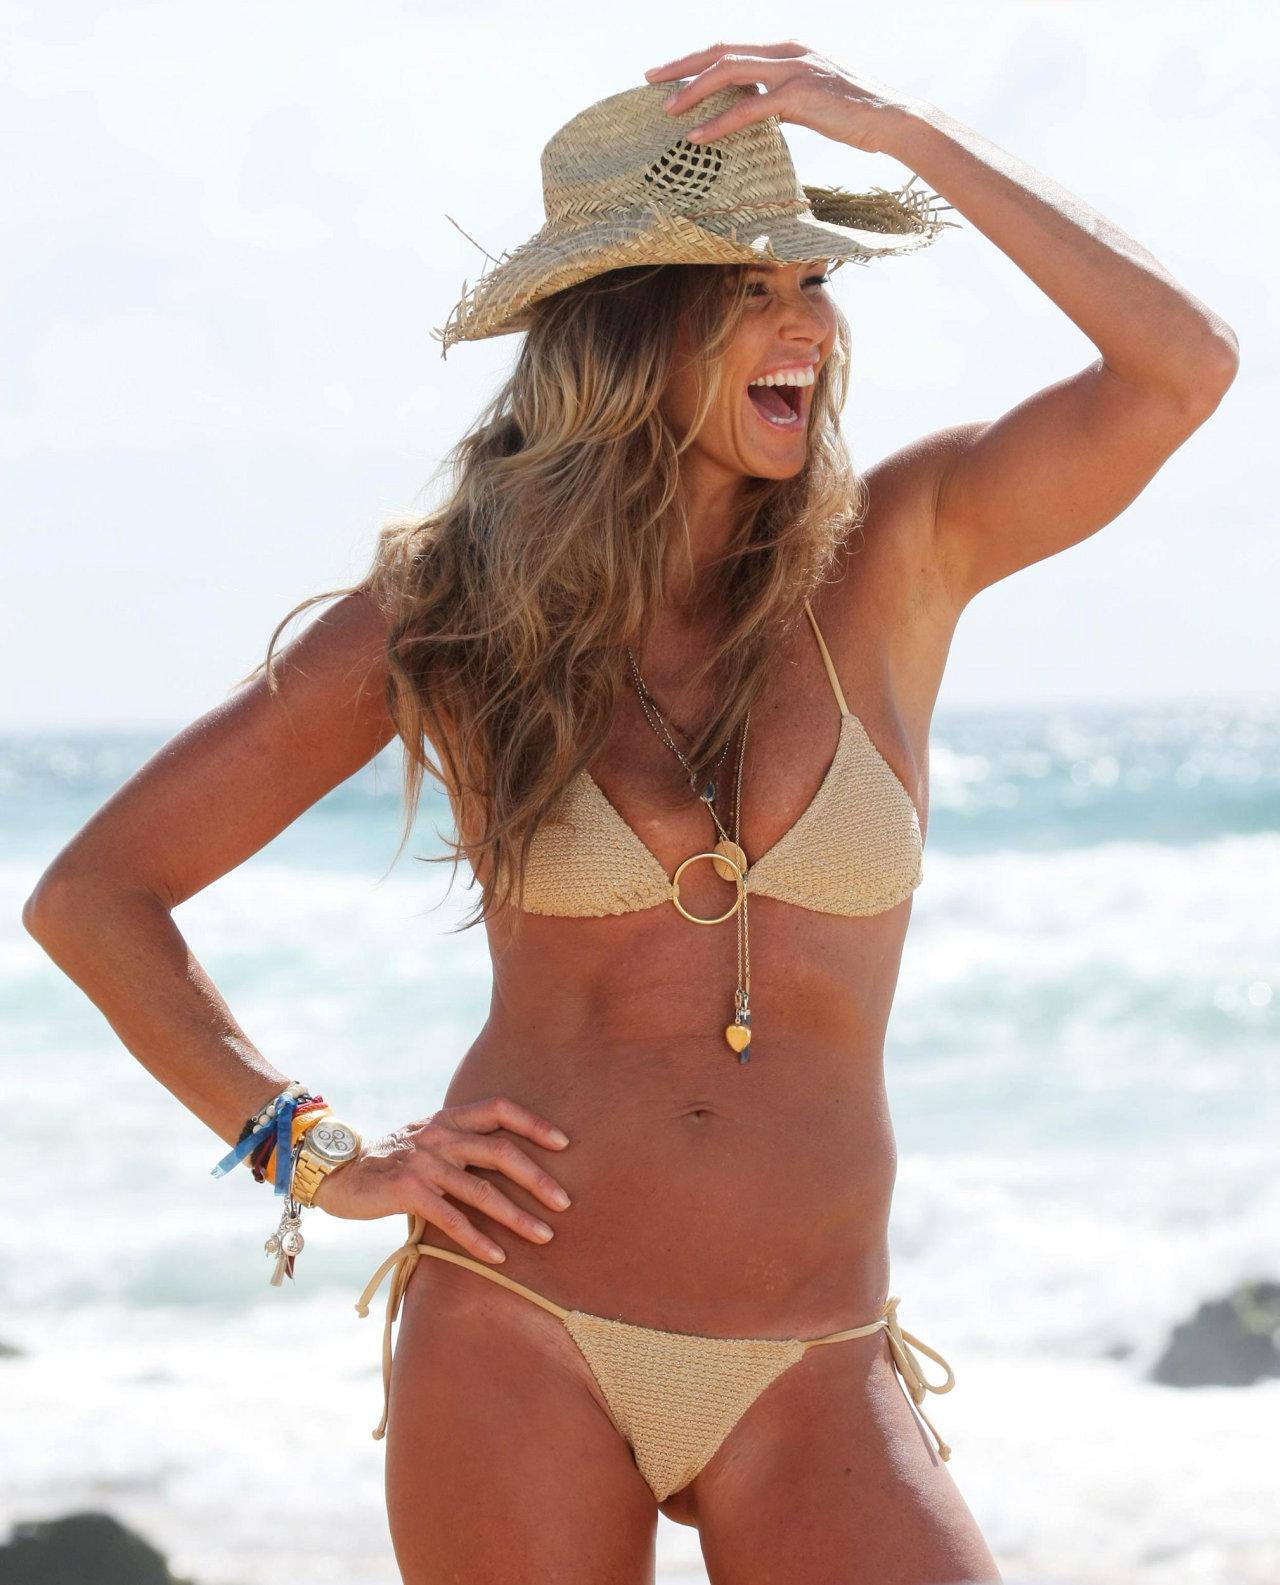 Elle Macpherson Bikini Bodies